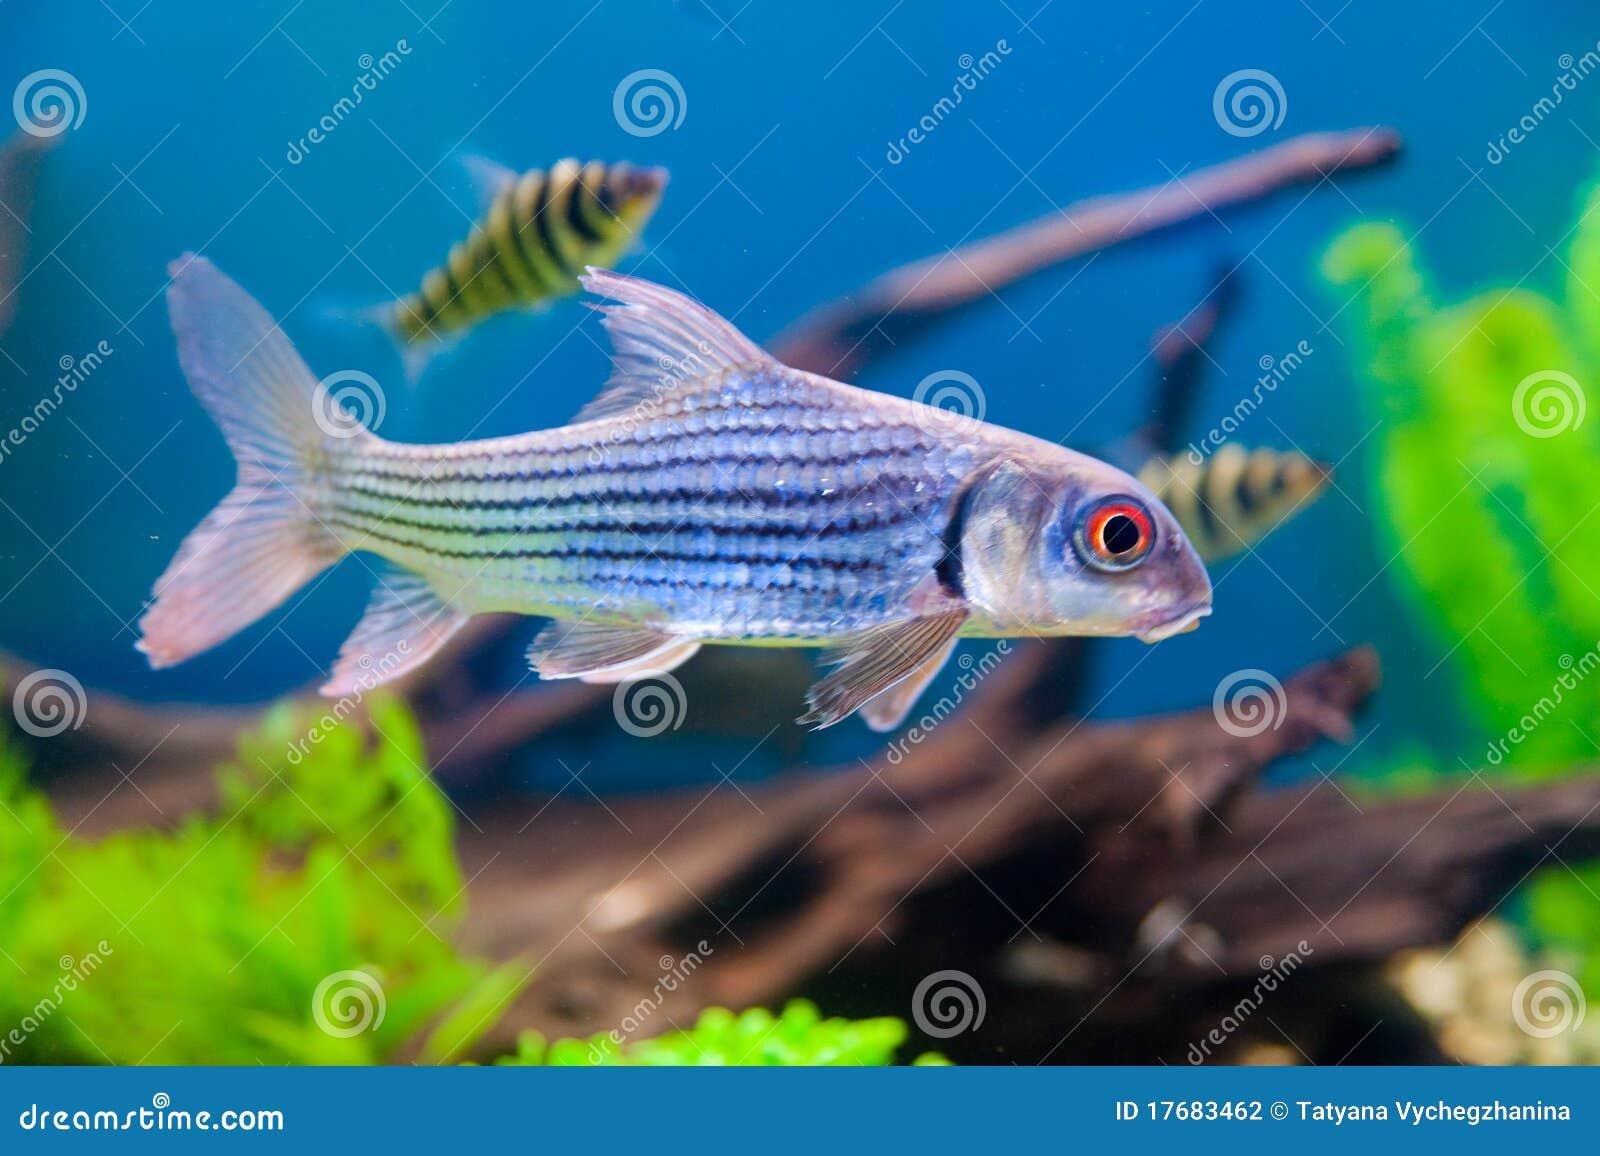 Colorful Fish Aquarium Stock Photography Image 17683462